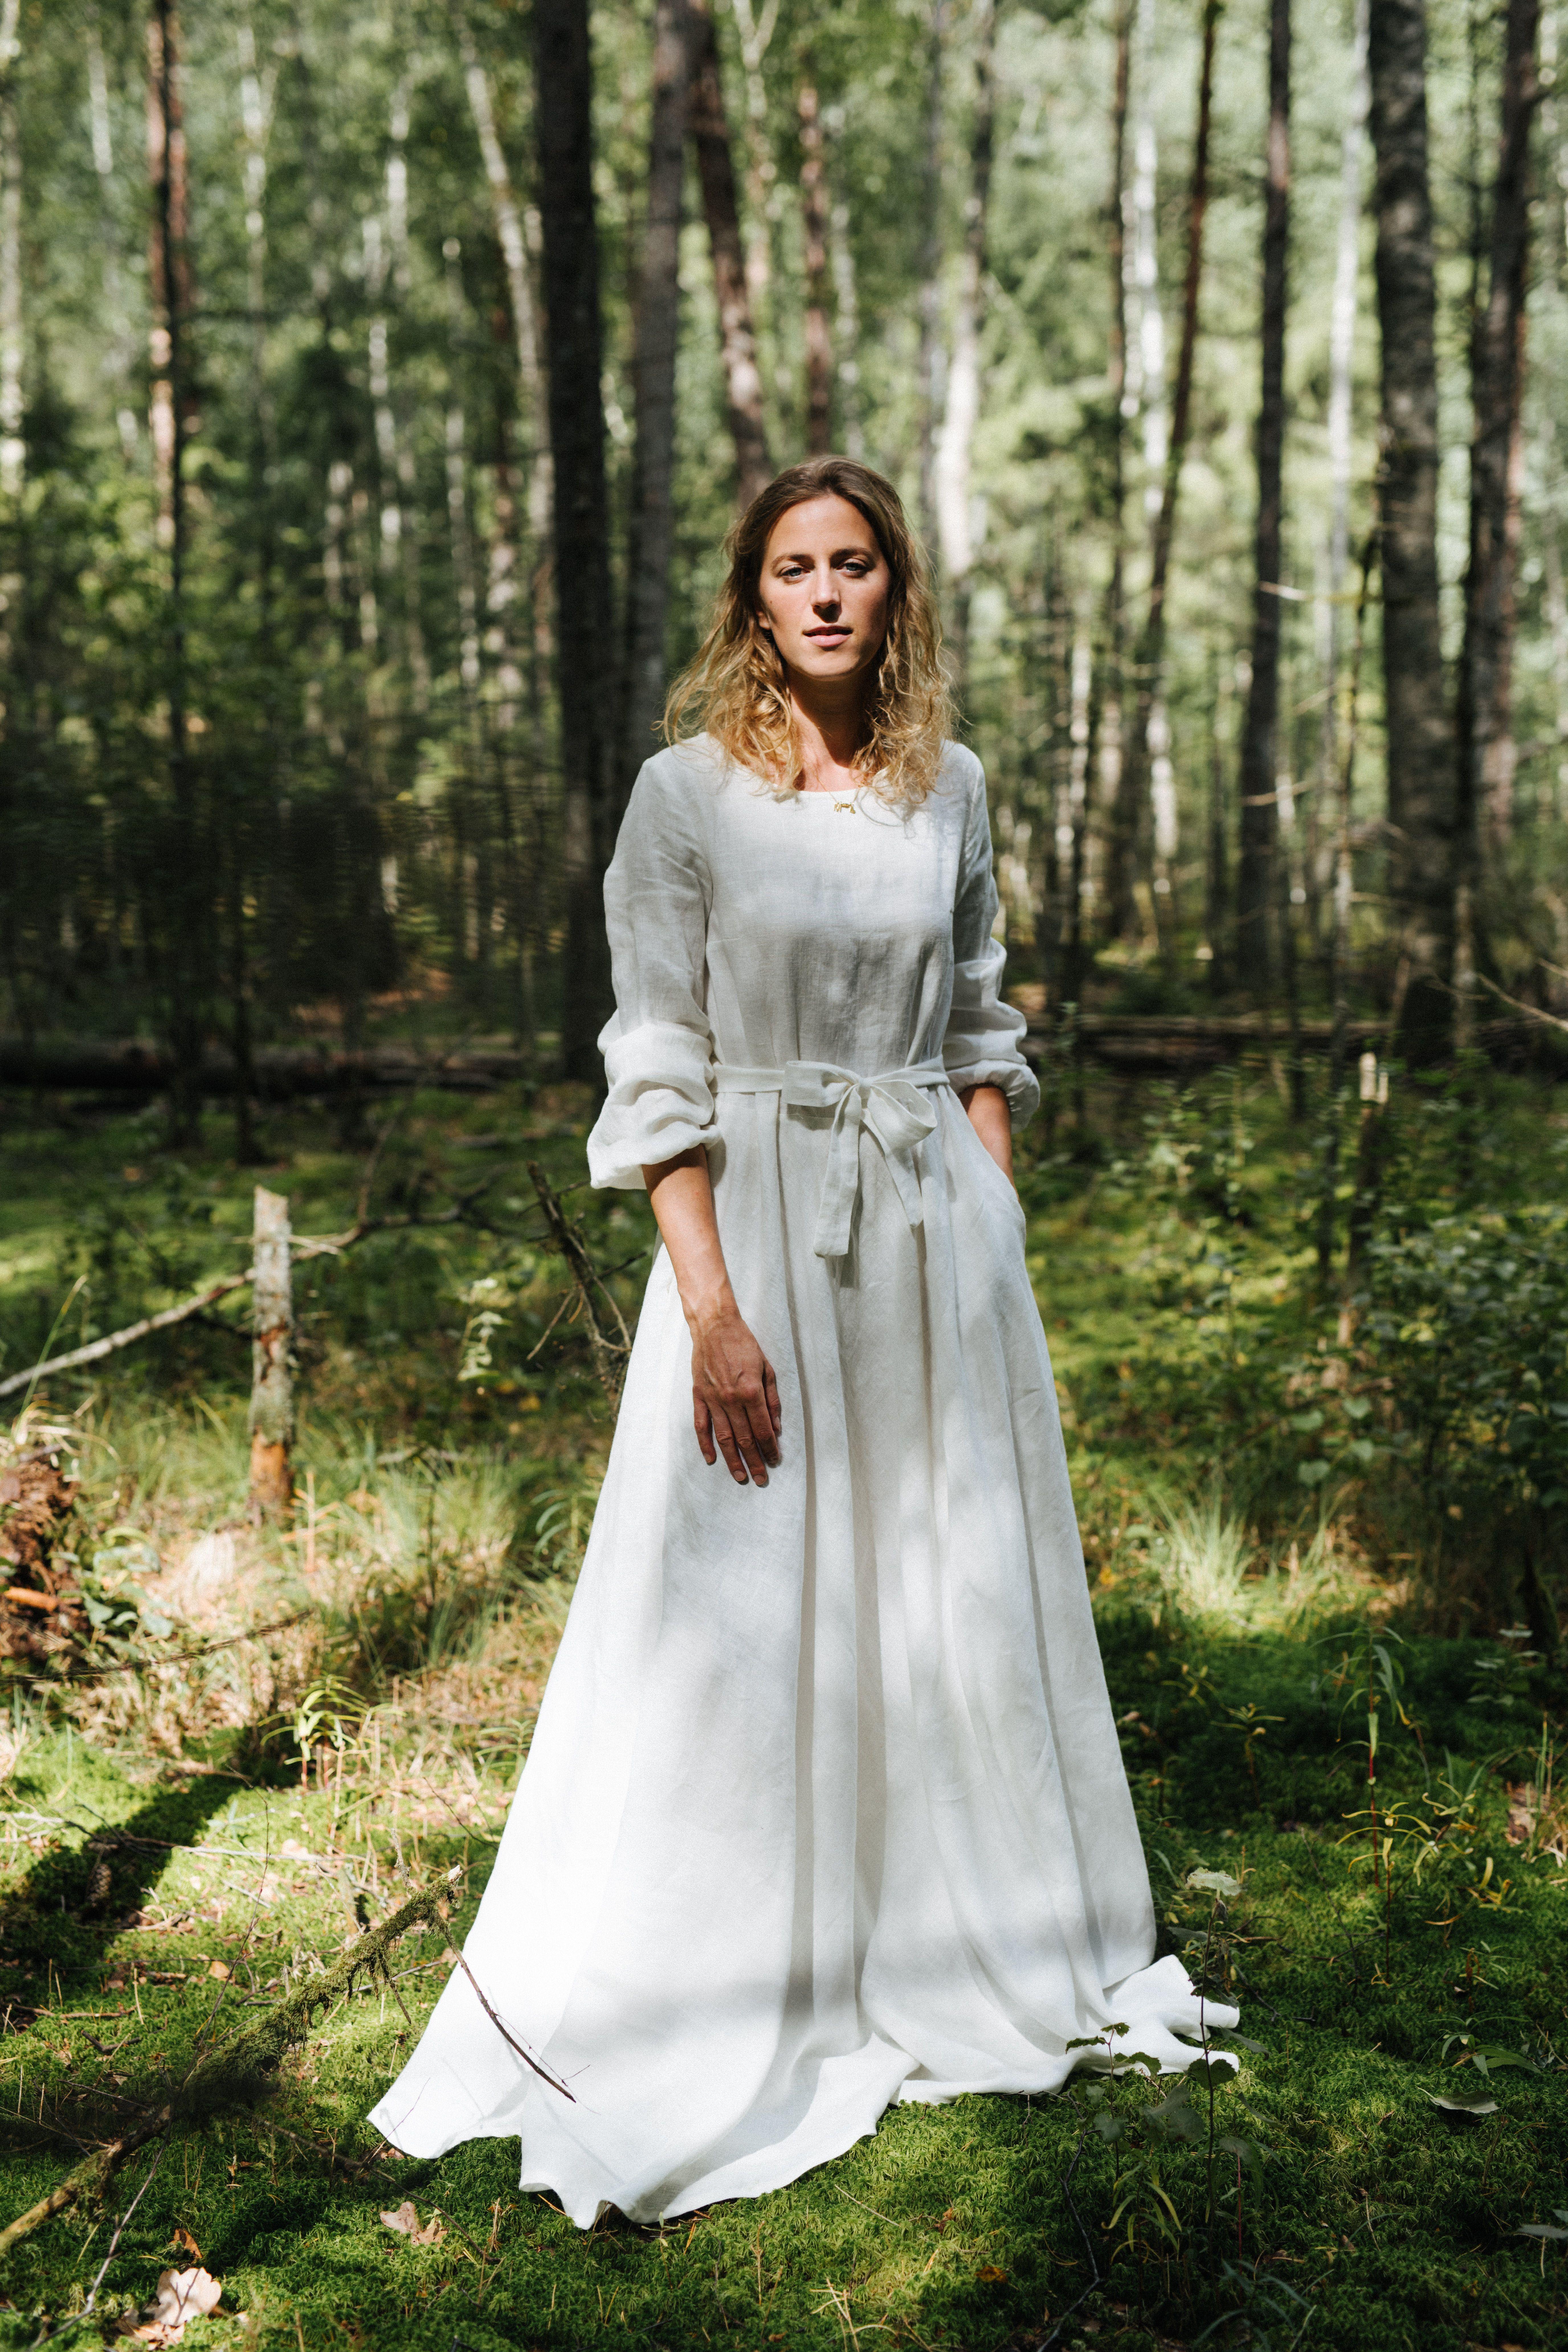 Boho Wedding Dress Linen Wedding Dress Rustic Wedding Dress Classic Wedding Dress Wide Skirt Wedding Dress White Wedding Dress Etsy Wedding Dress Linen Dresses Linen Wedding Dress